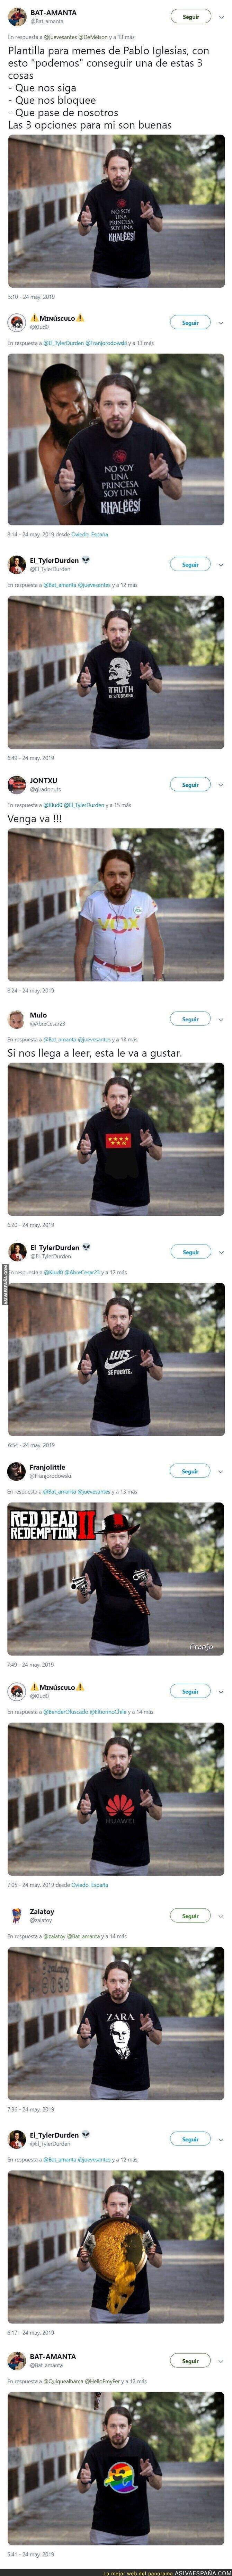 112960 - Tanda de chops con la camiseta de Pablo Iglesias